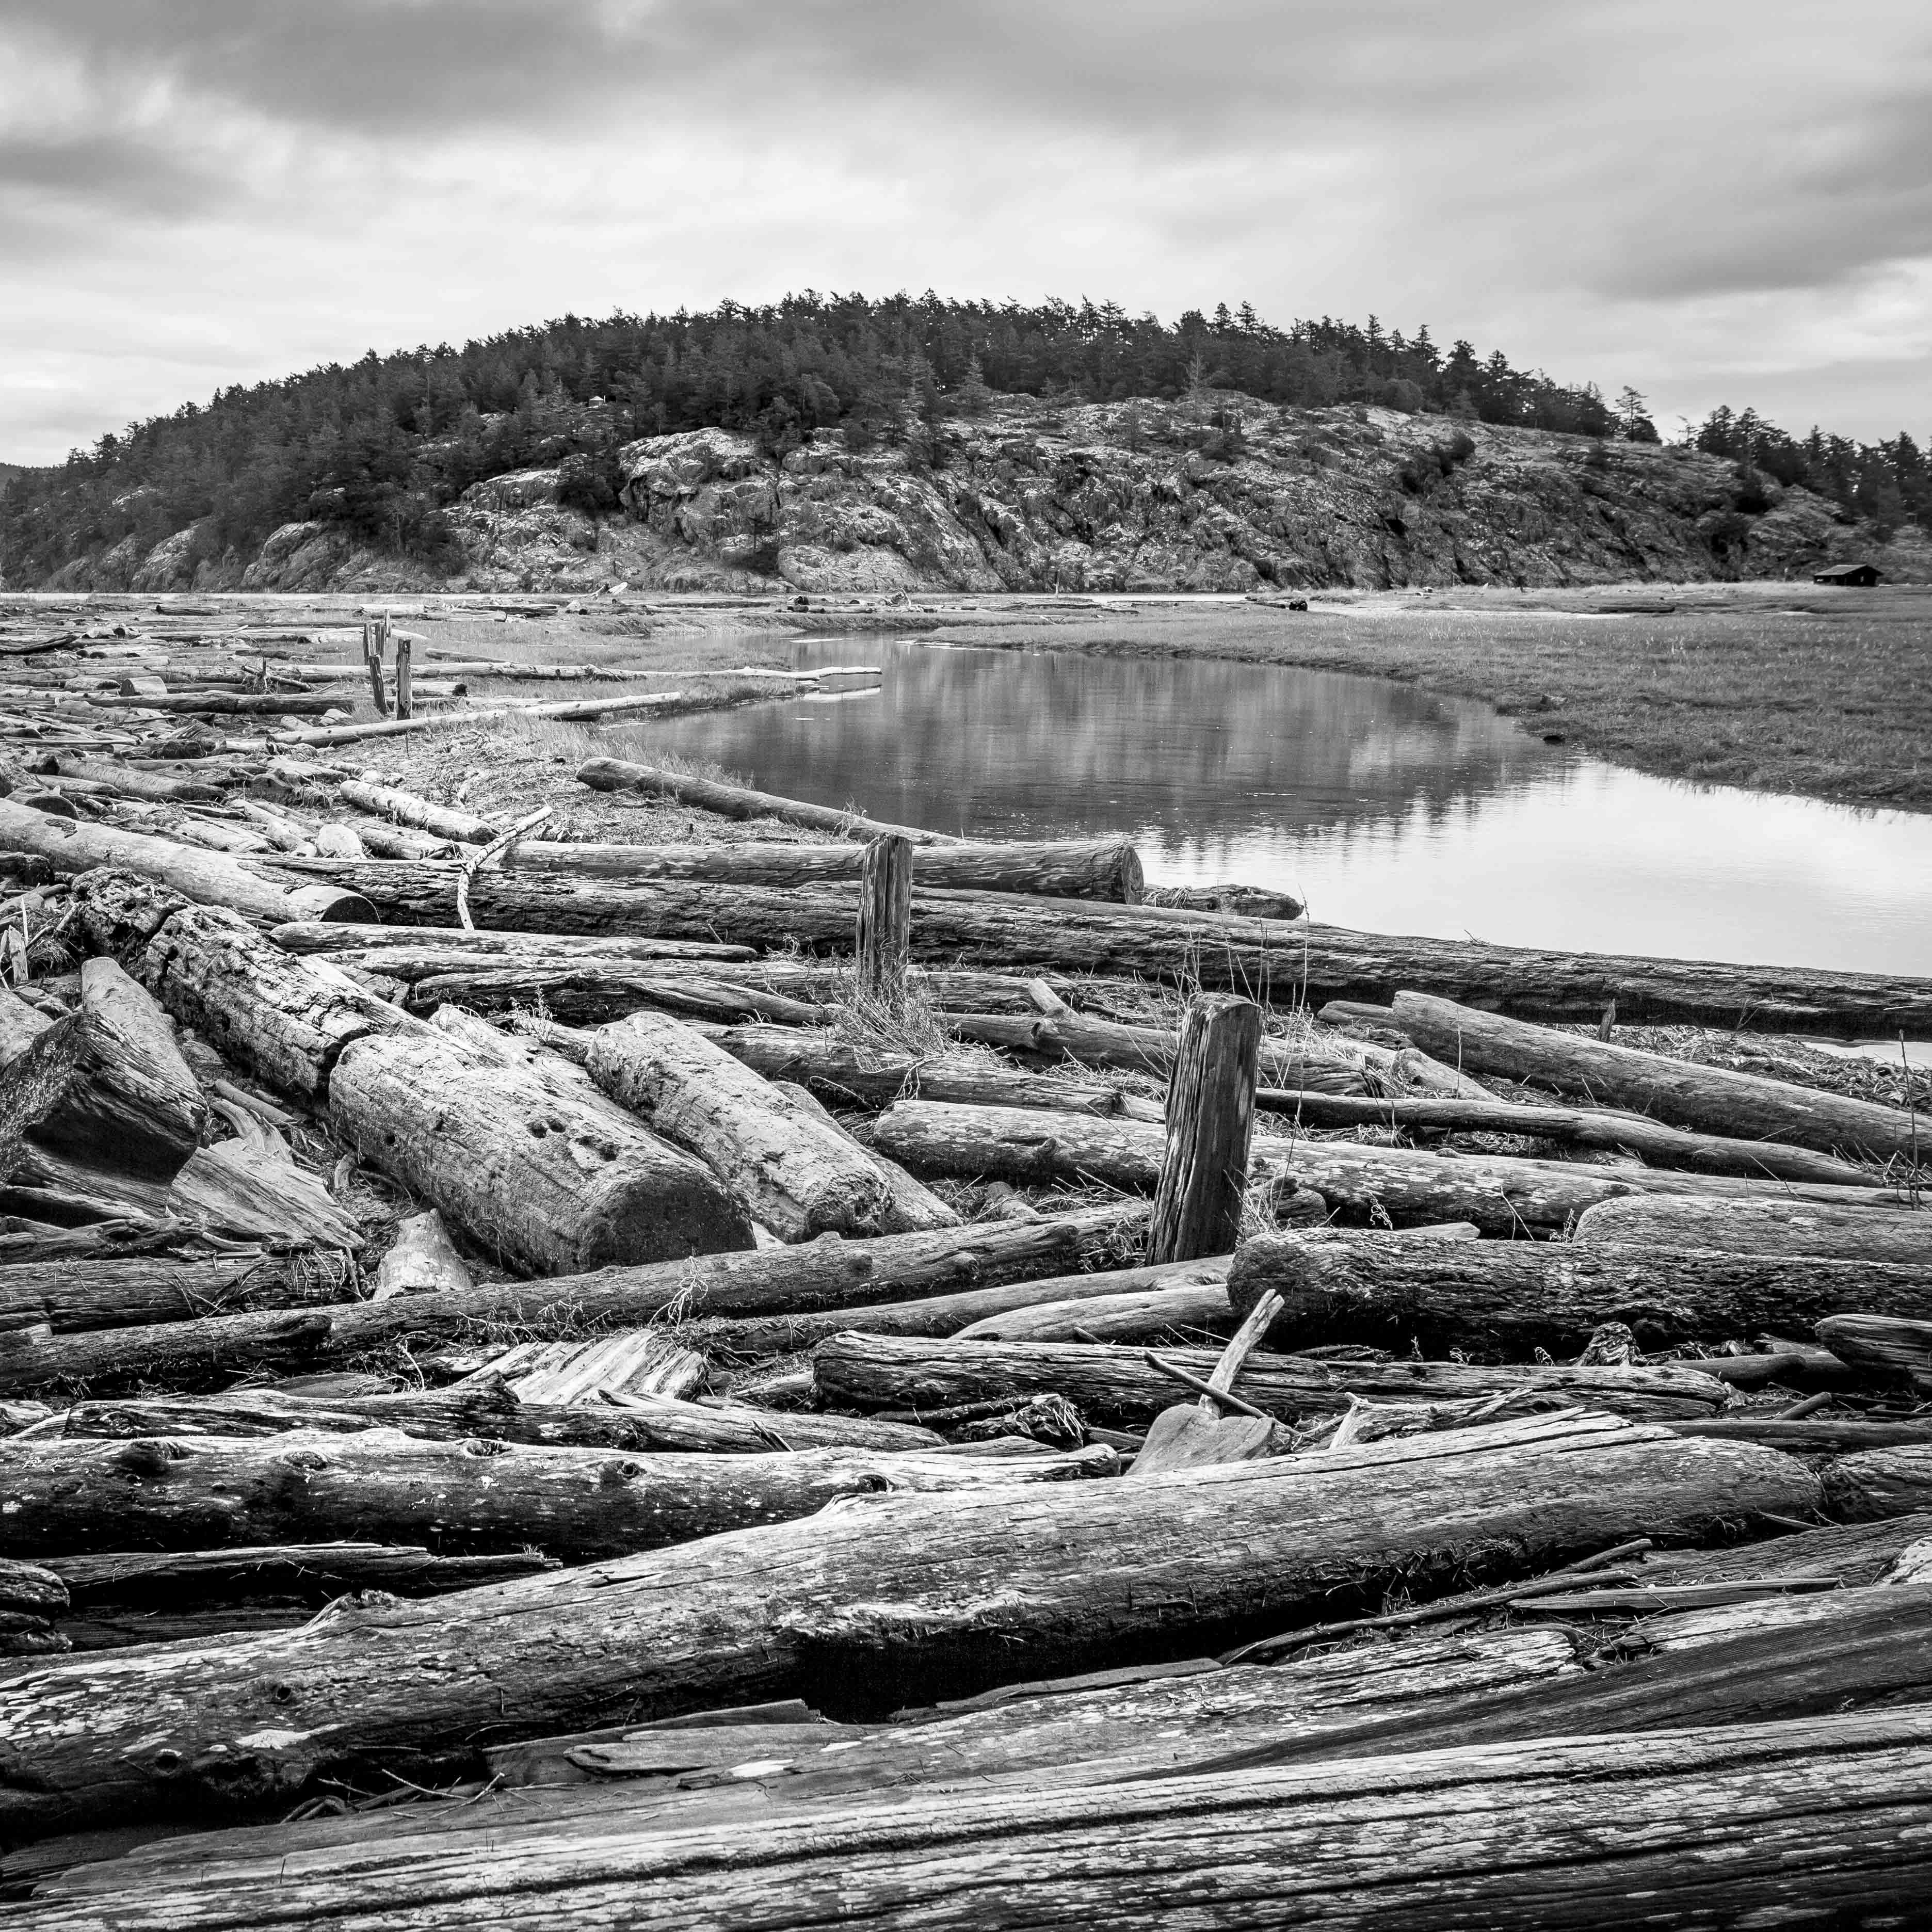 Drift Logs. Spencer Spit SP. 2017. Lopez, Island, WA.